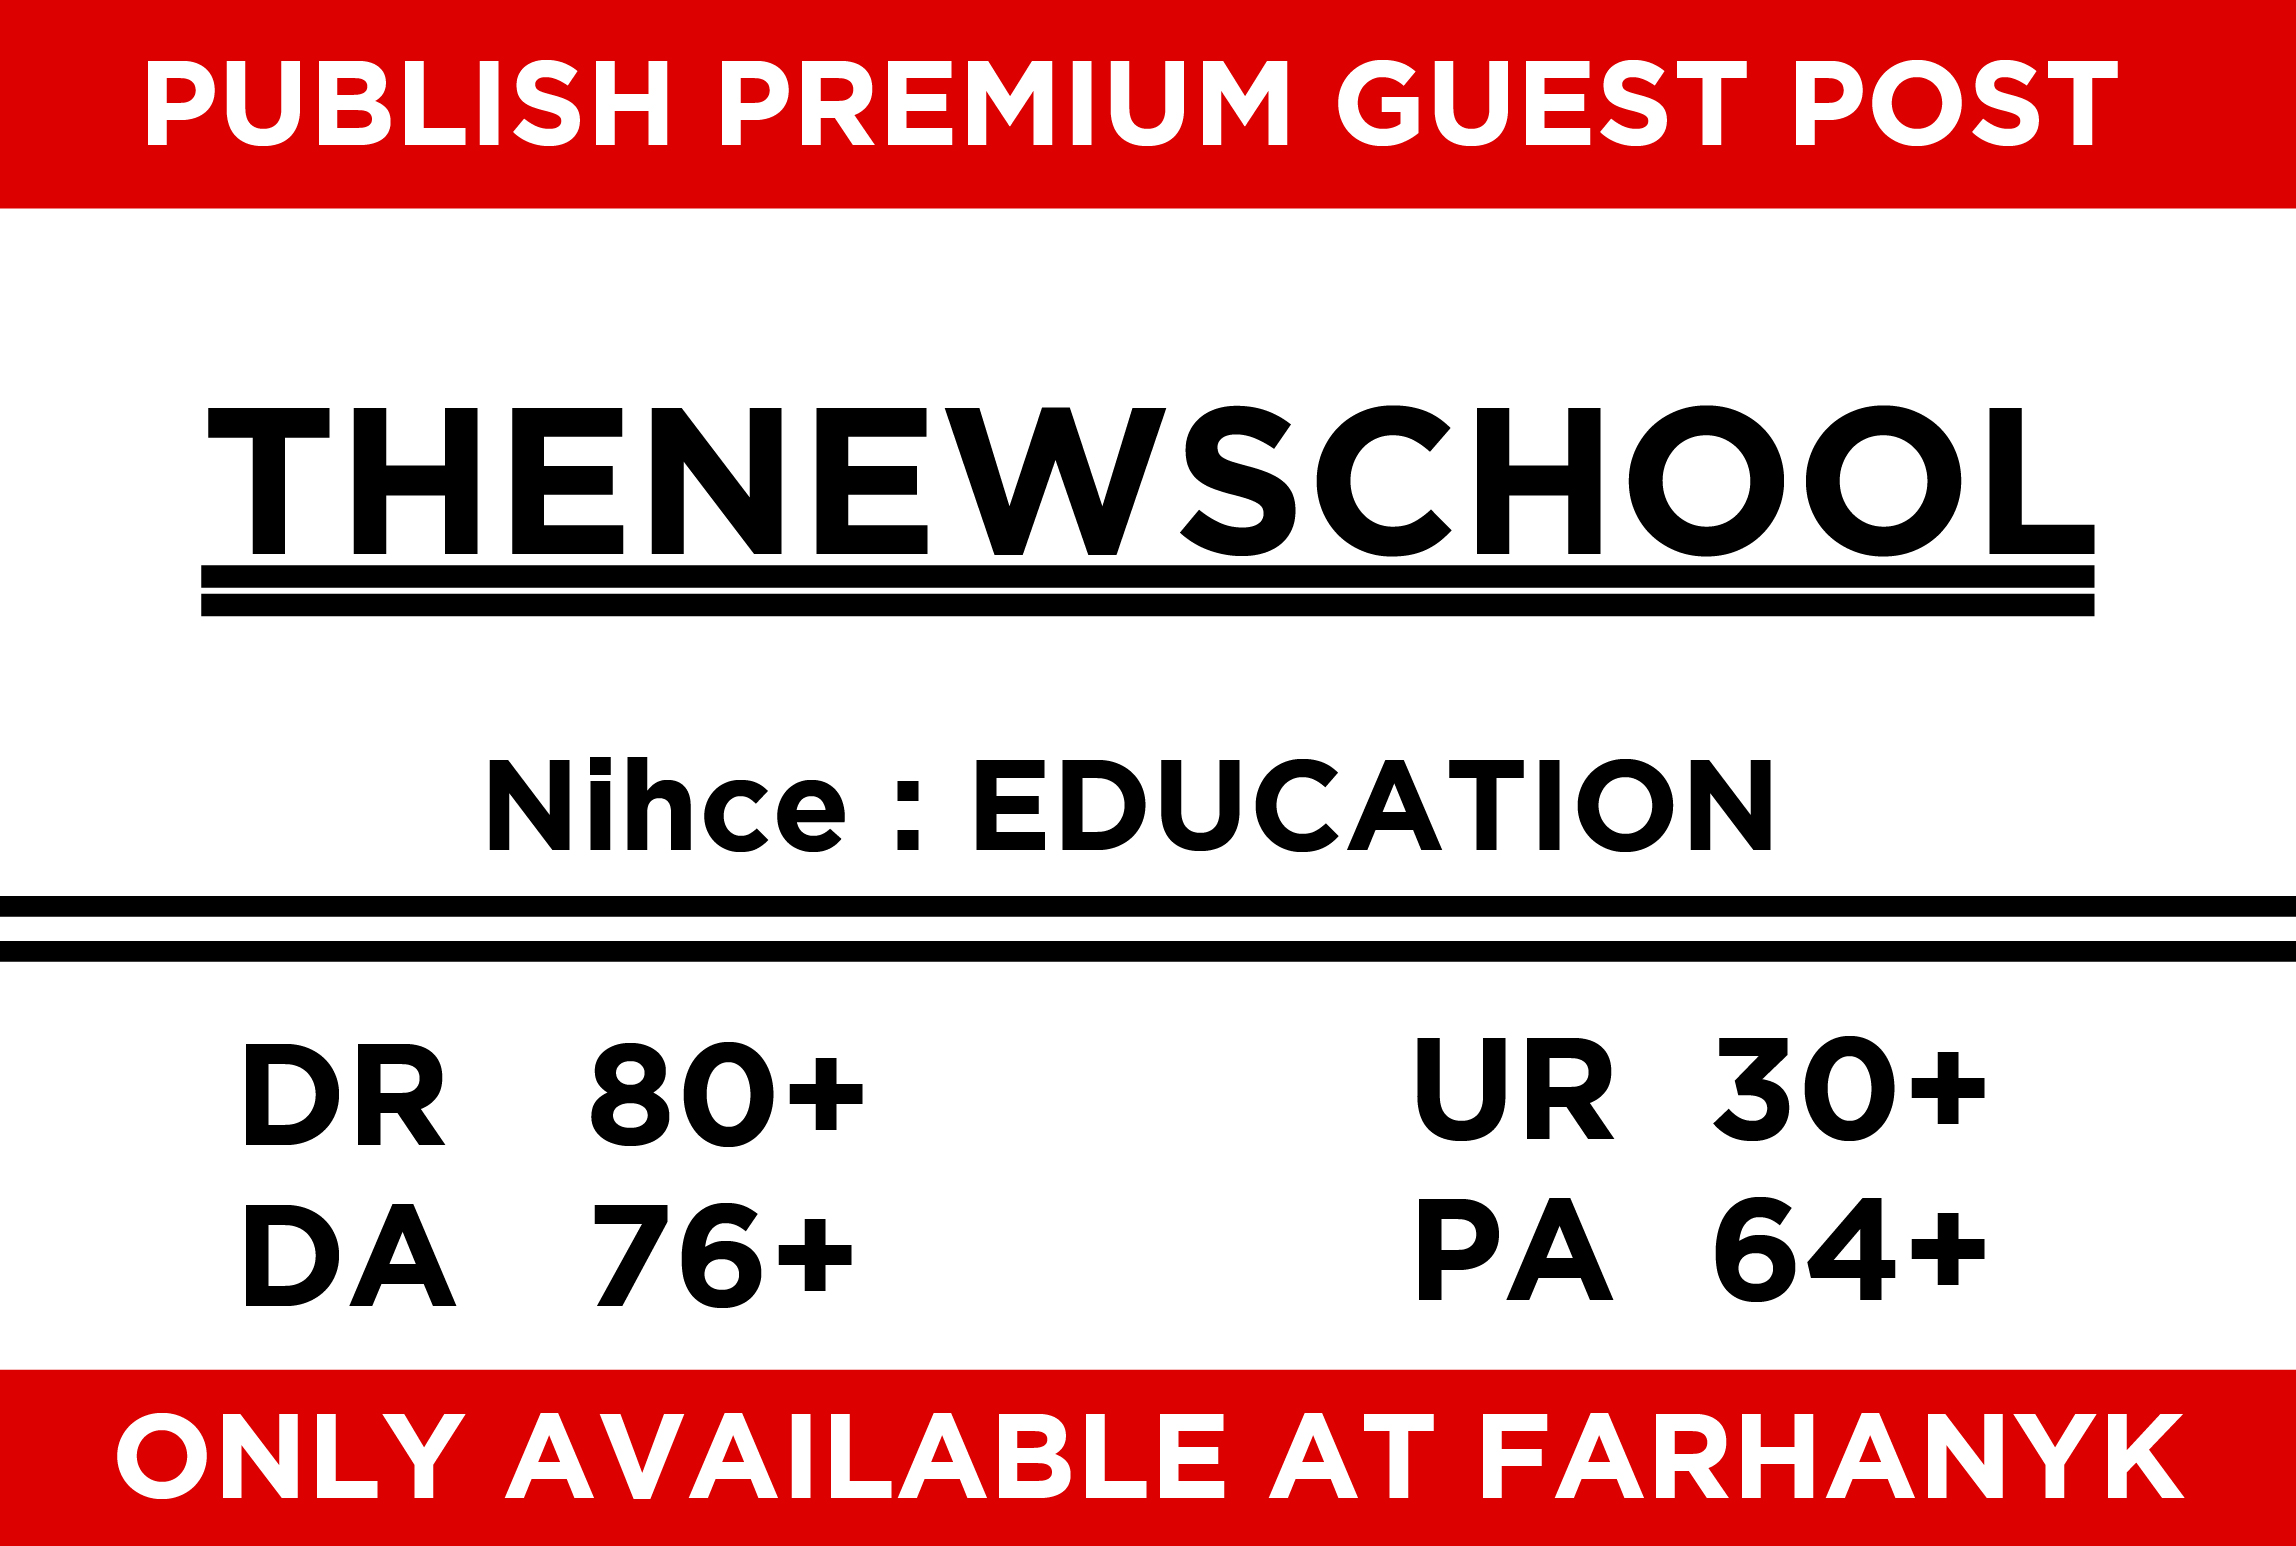 publish a guest post on newschool dot edu da 76